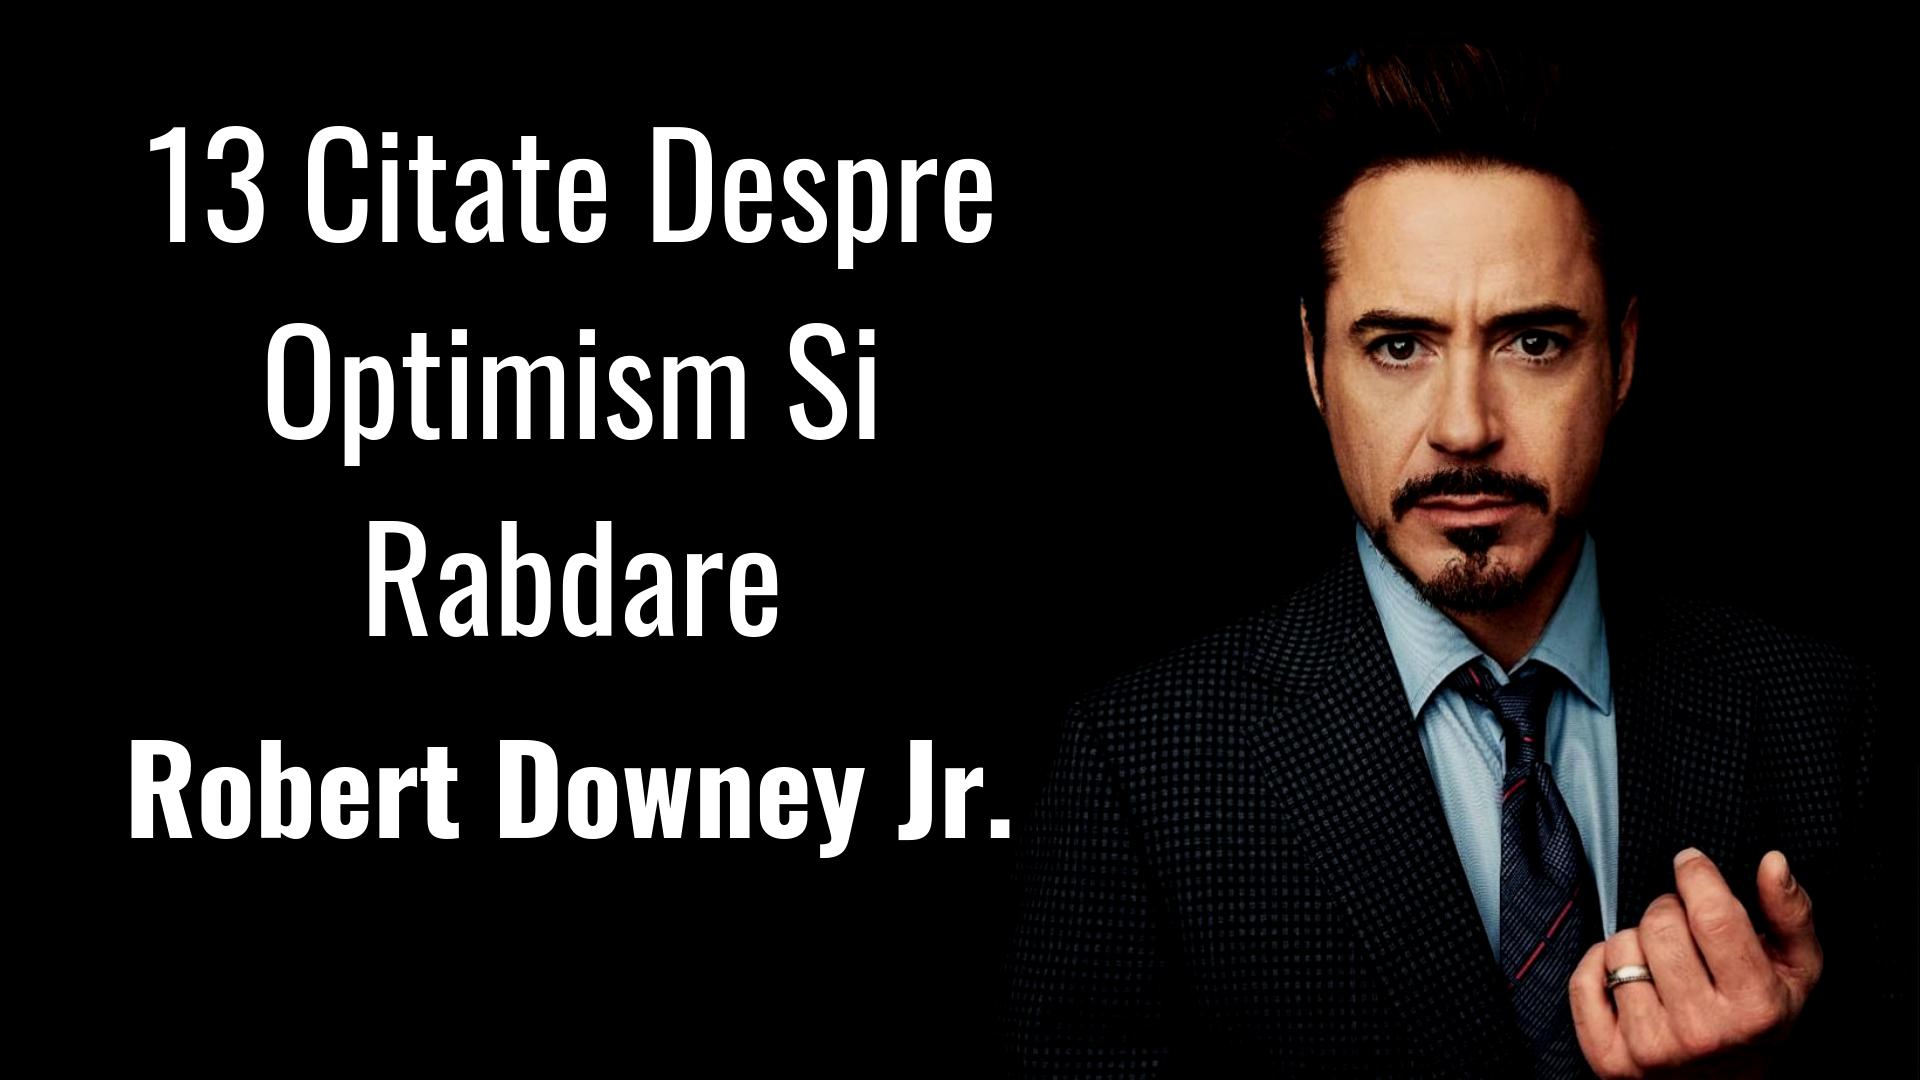 citate despre rabdare Robert Downey Jr.   13 Citate Despre Optimism Si Rabdare | Leo  citate despre rabdare